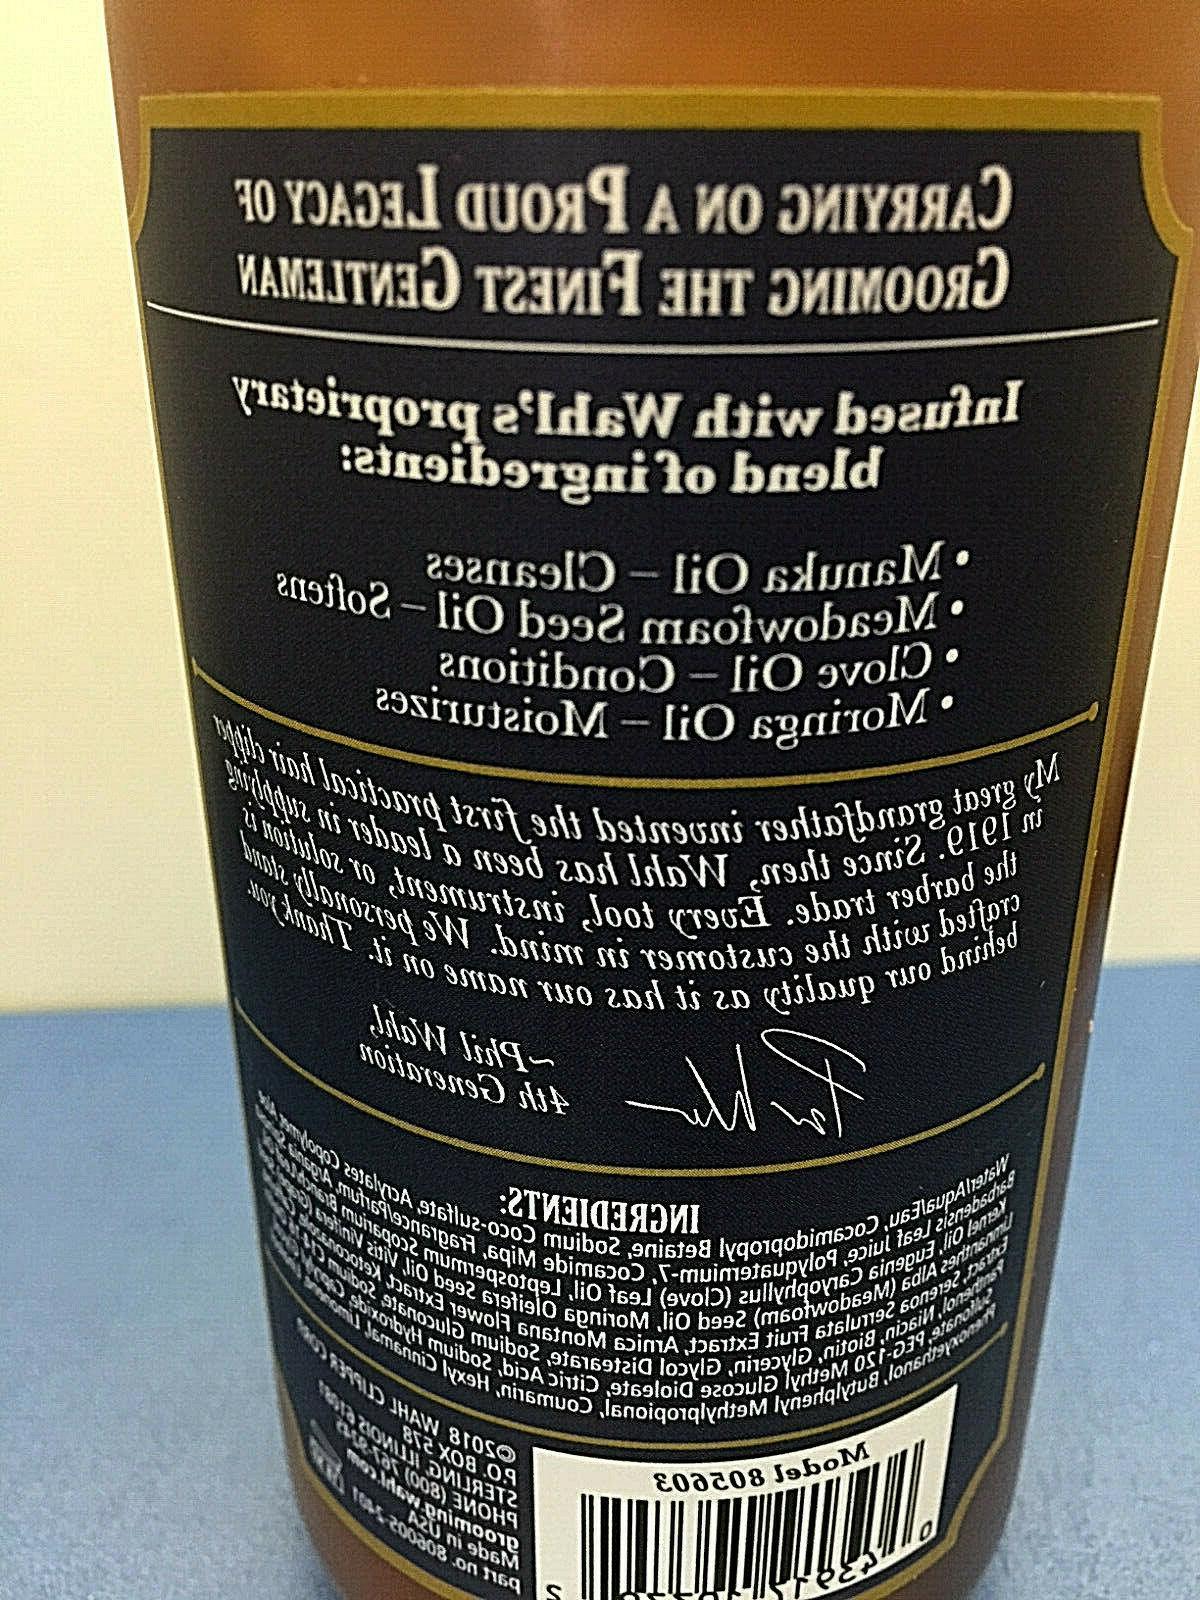 WAHL Healthy Hair oz pump bottle